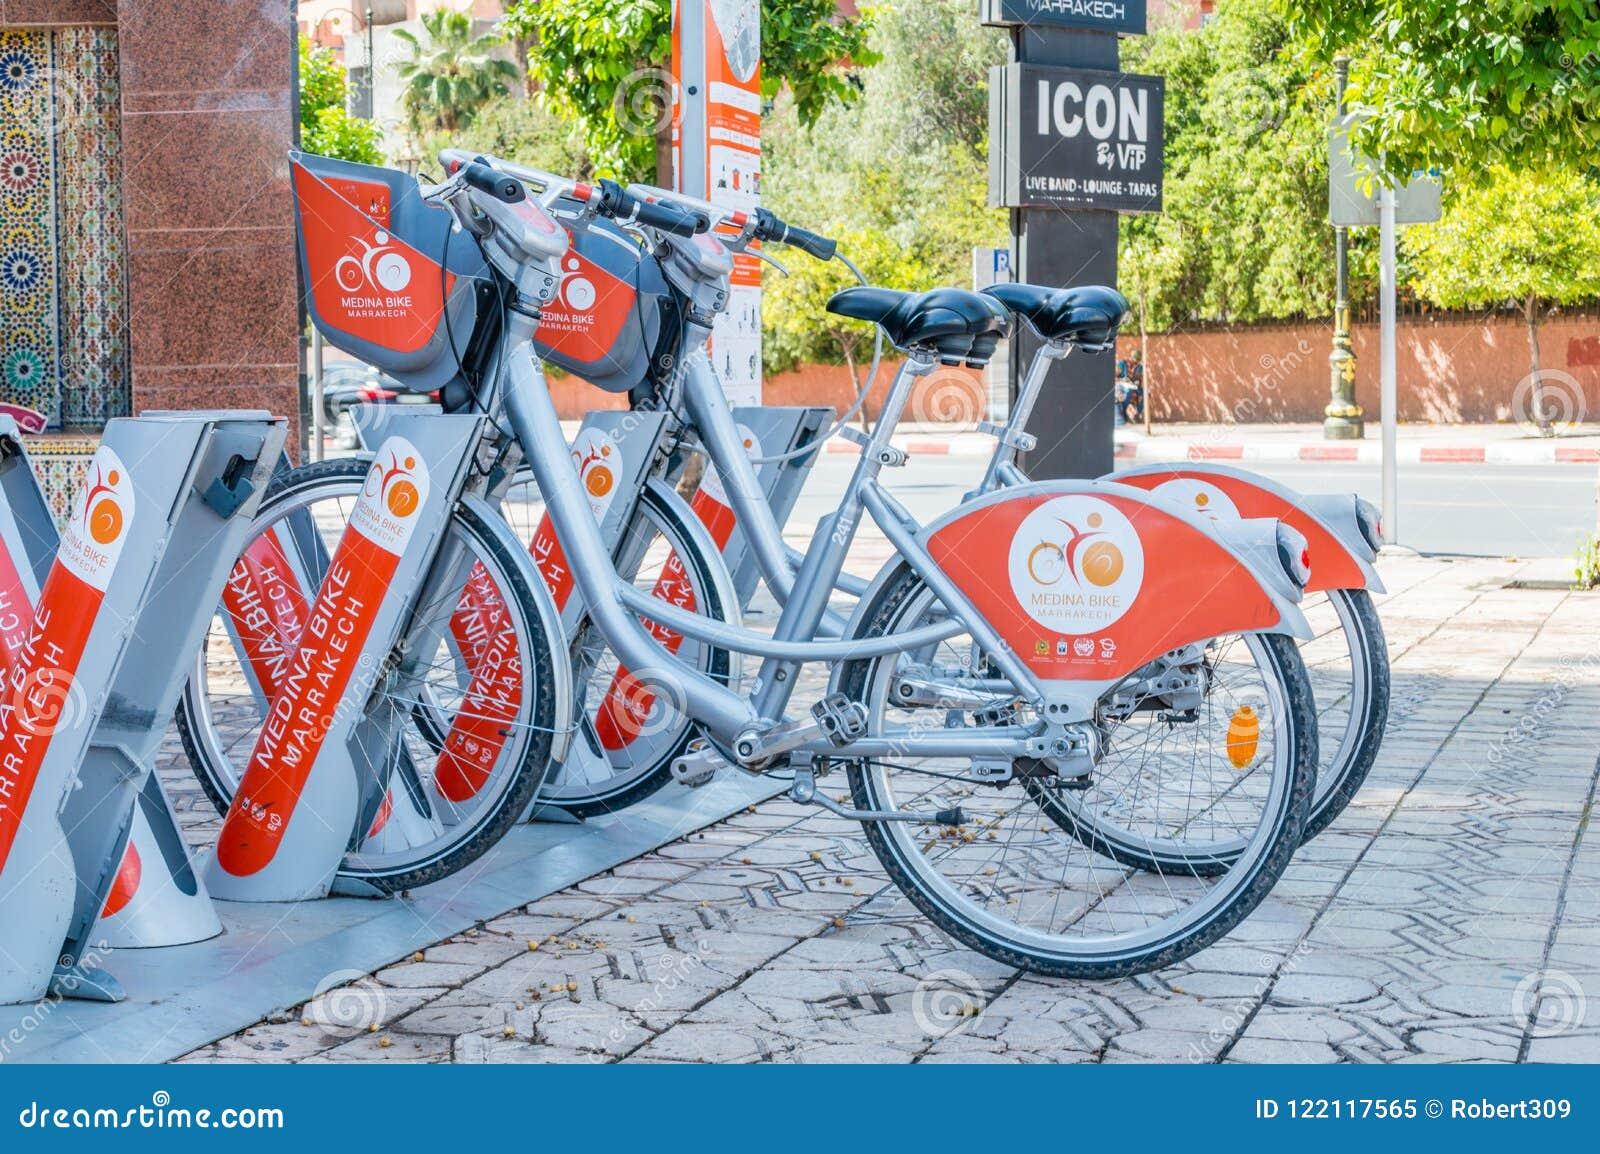 Medina Bike For Rent In Marrakech. Editorial Image - Image of medina ... 9e3f70251